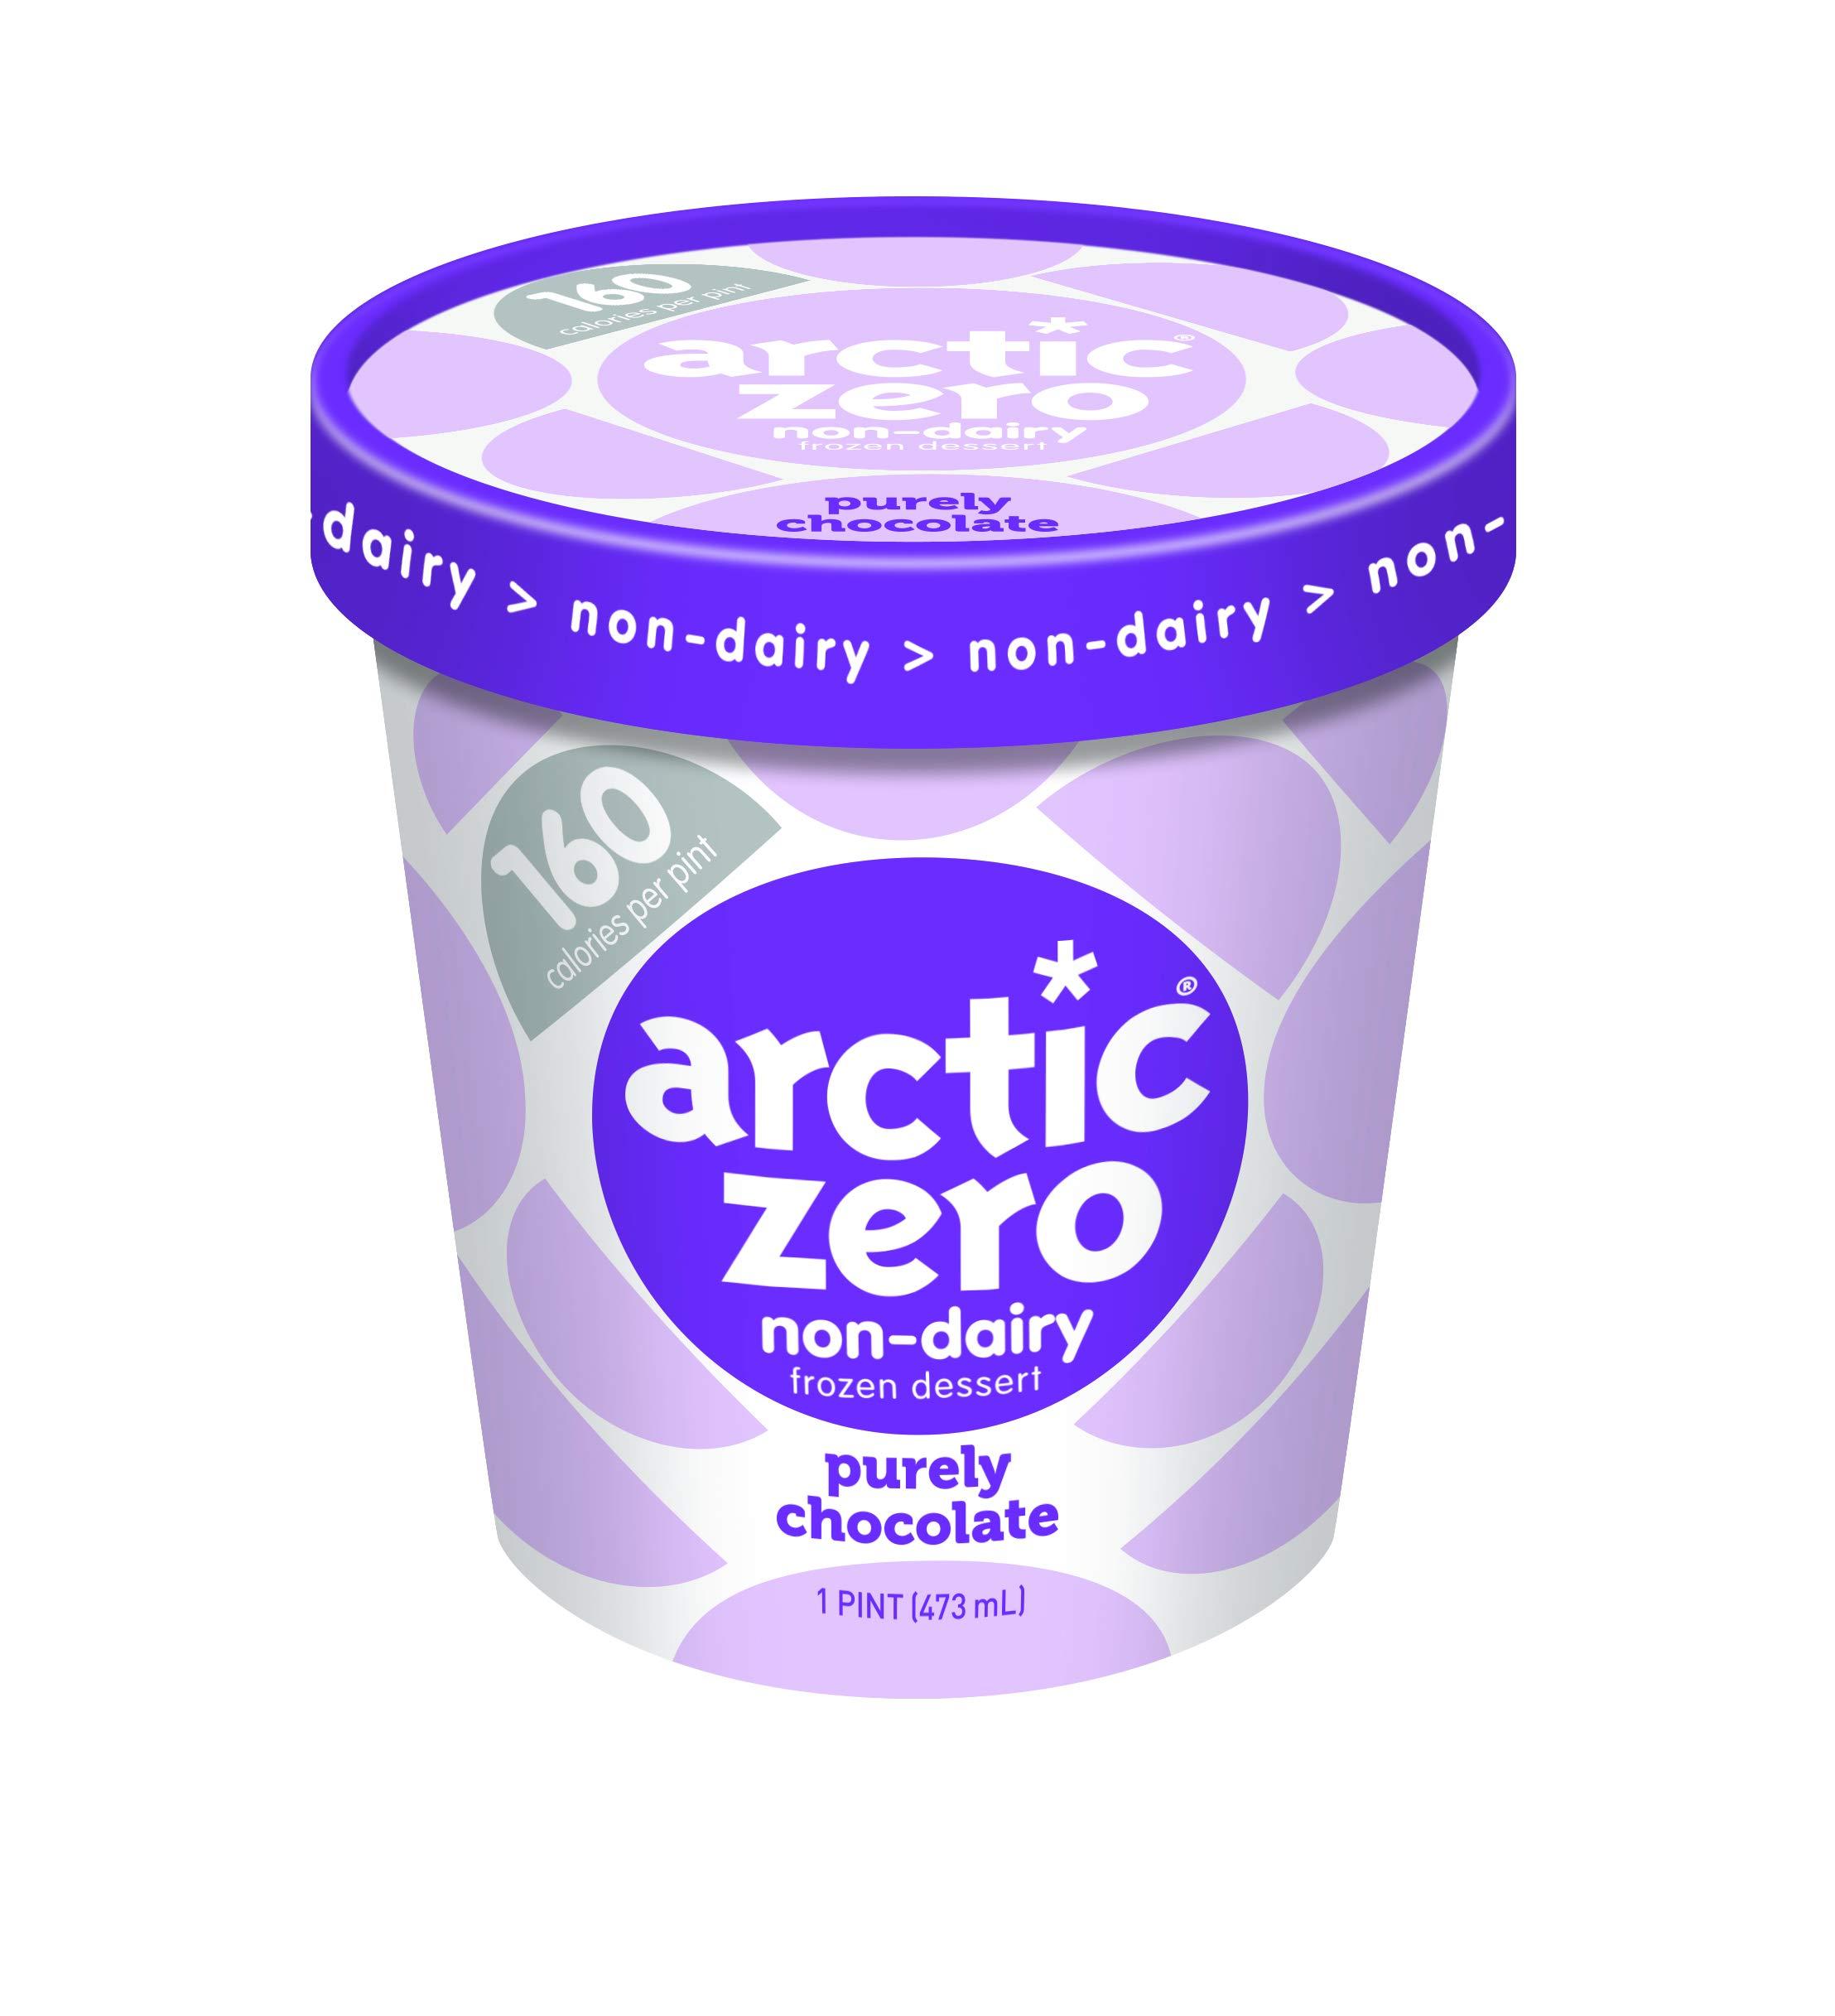 Arctic Zero Purely Chocolate , Pack of 6